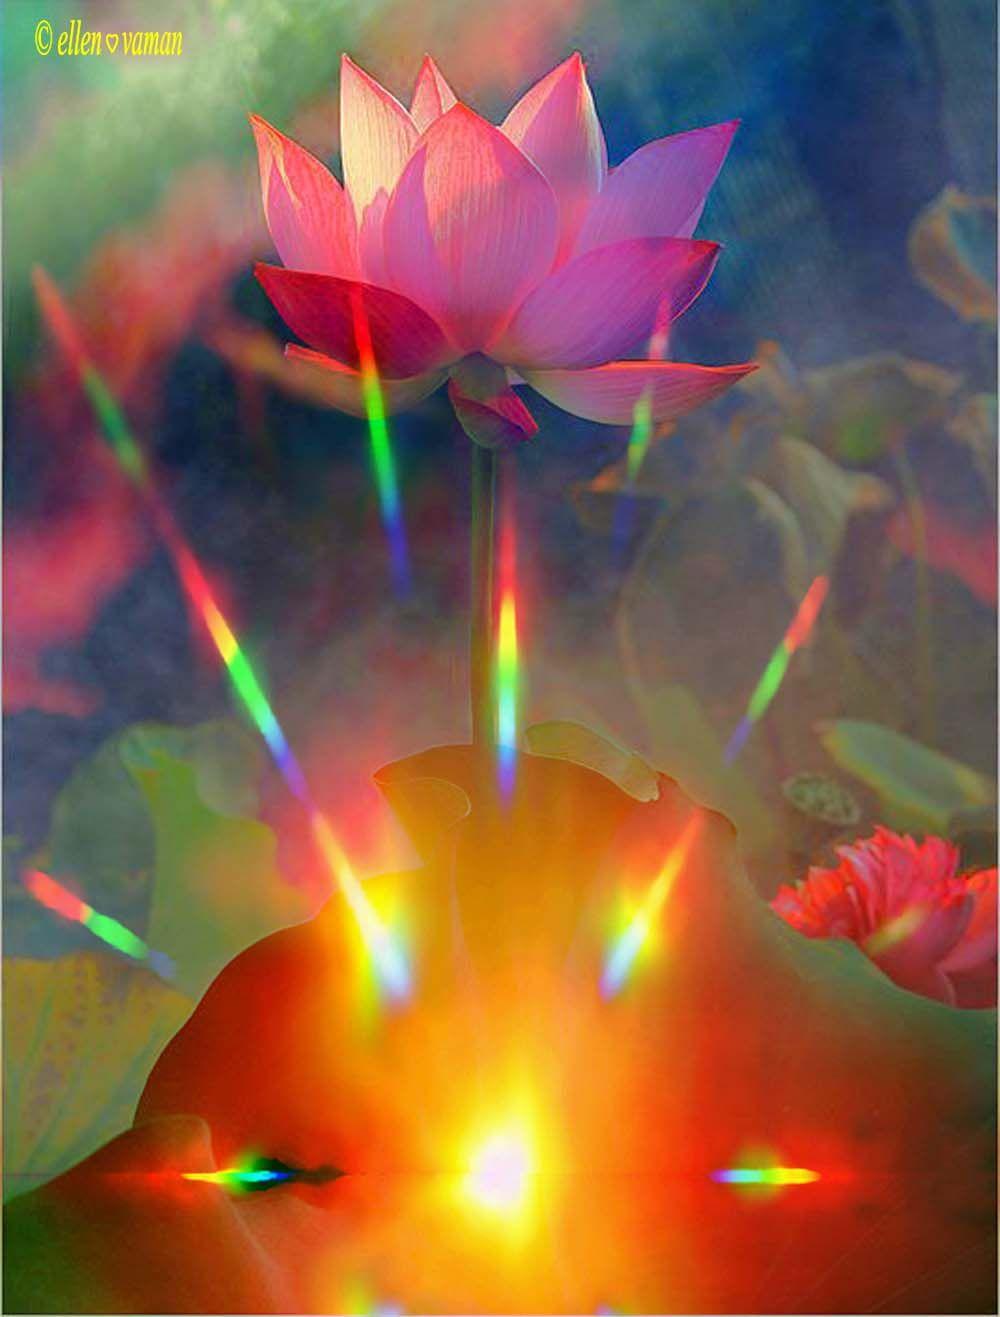 art © e11en♥ vaman  www.facebook.com/ellenvaman 1413 #EllenVaman #DigitalArt #Spirituality #Lotus #Evolution #Beauty #Light #Pinterest